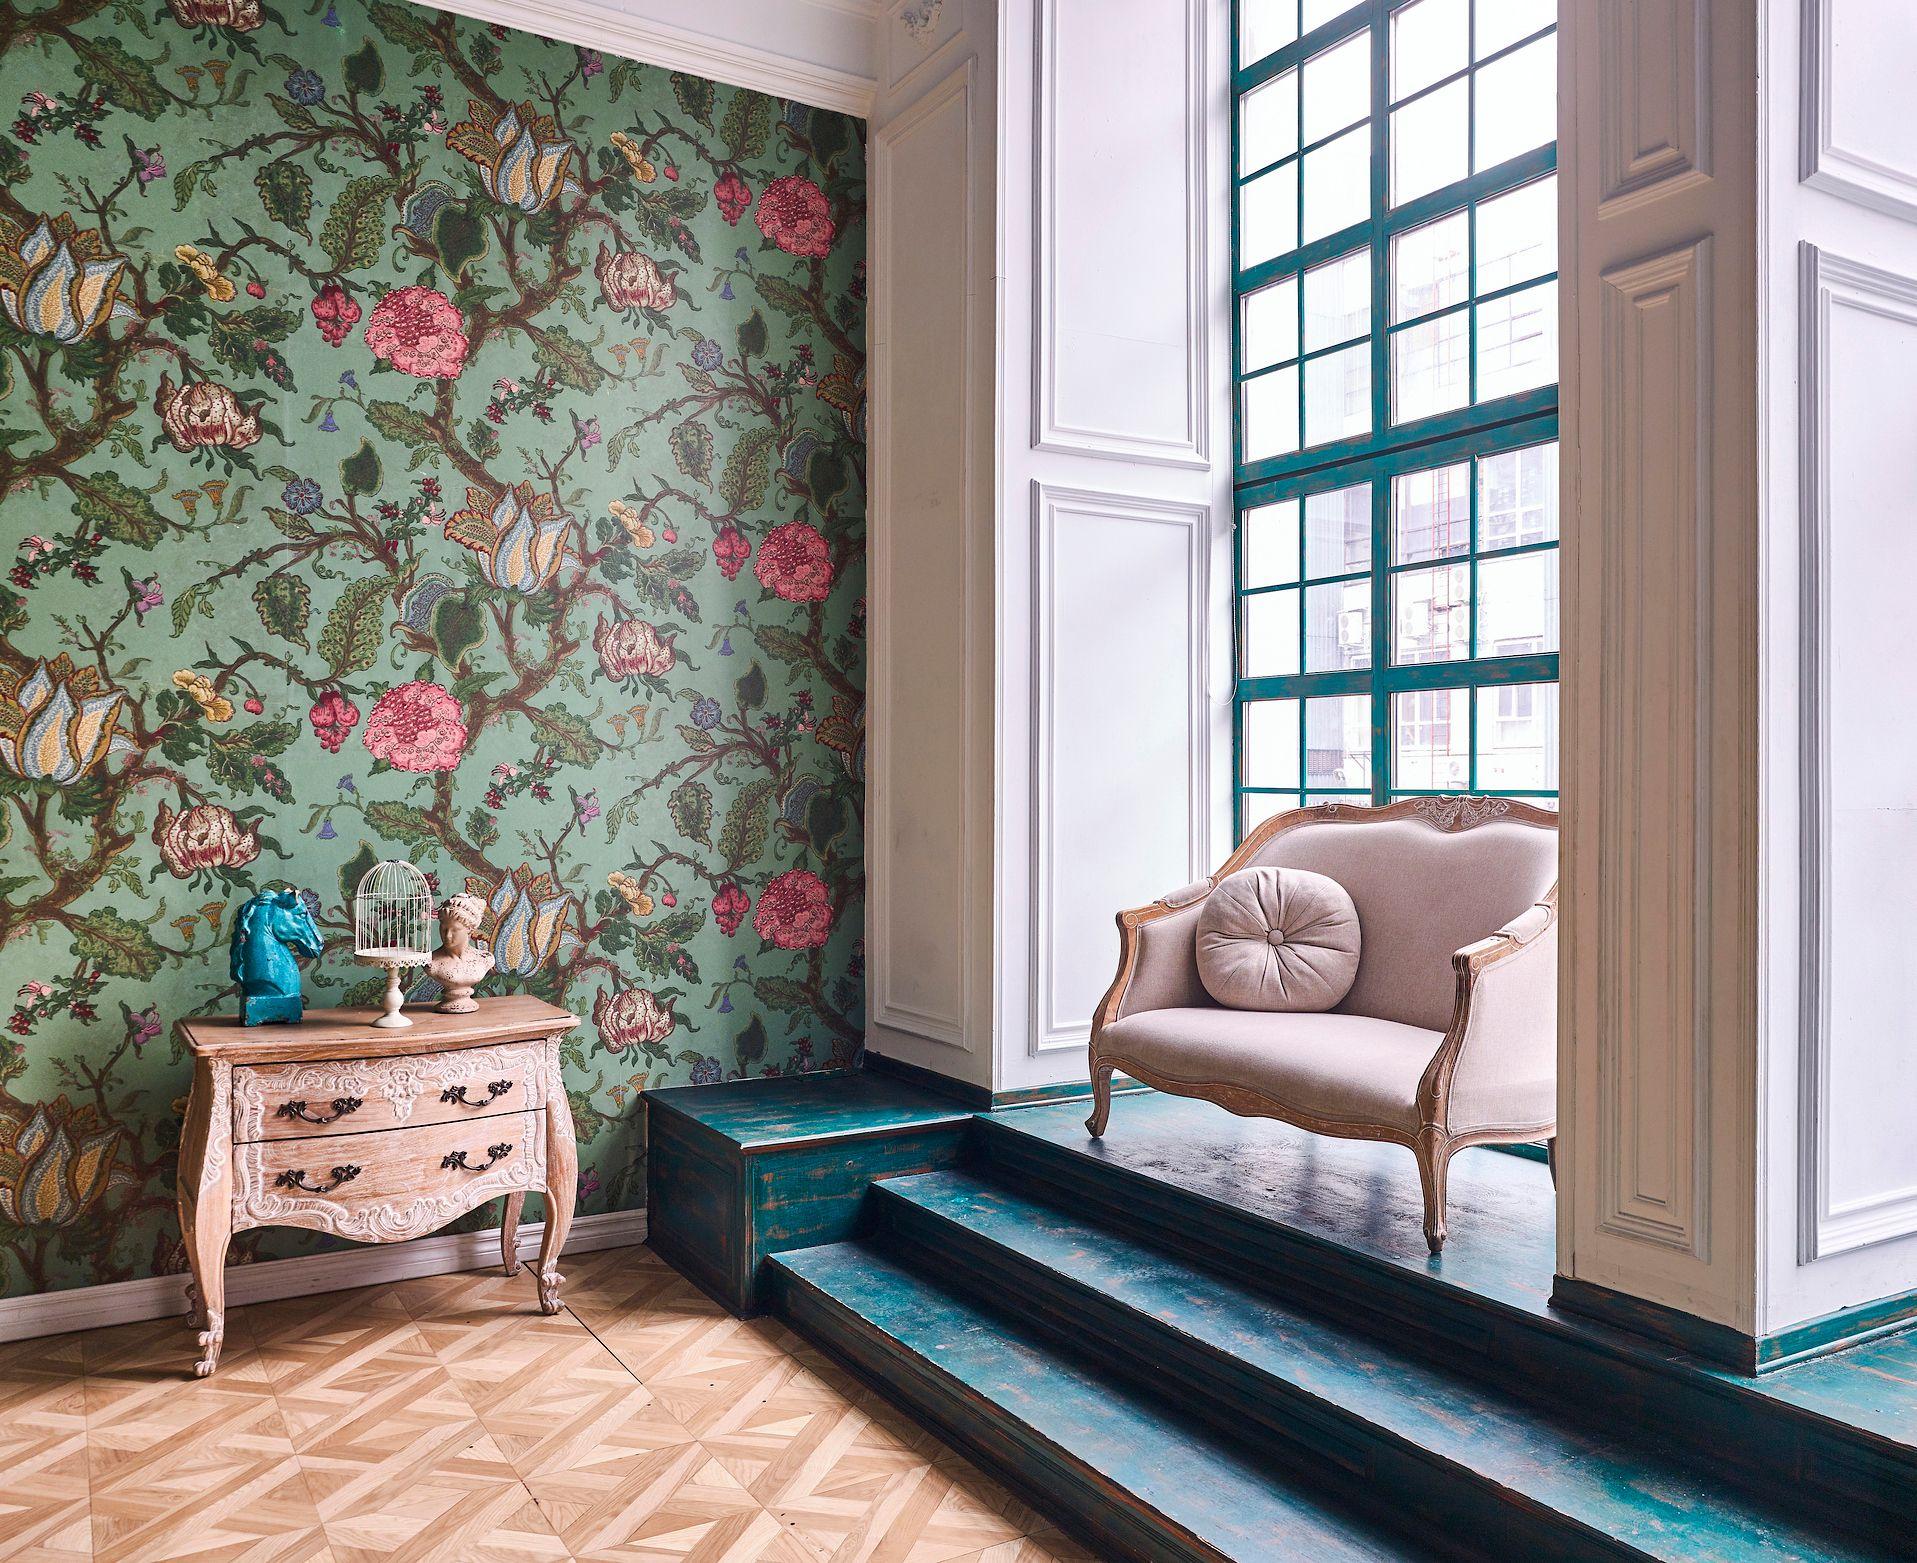 Diy Easily Interior Design Your Own Home Mymove Interior Design Your Own Home Interior Design Your Home Home Decor